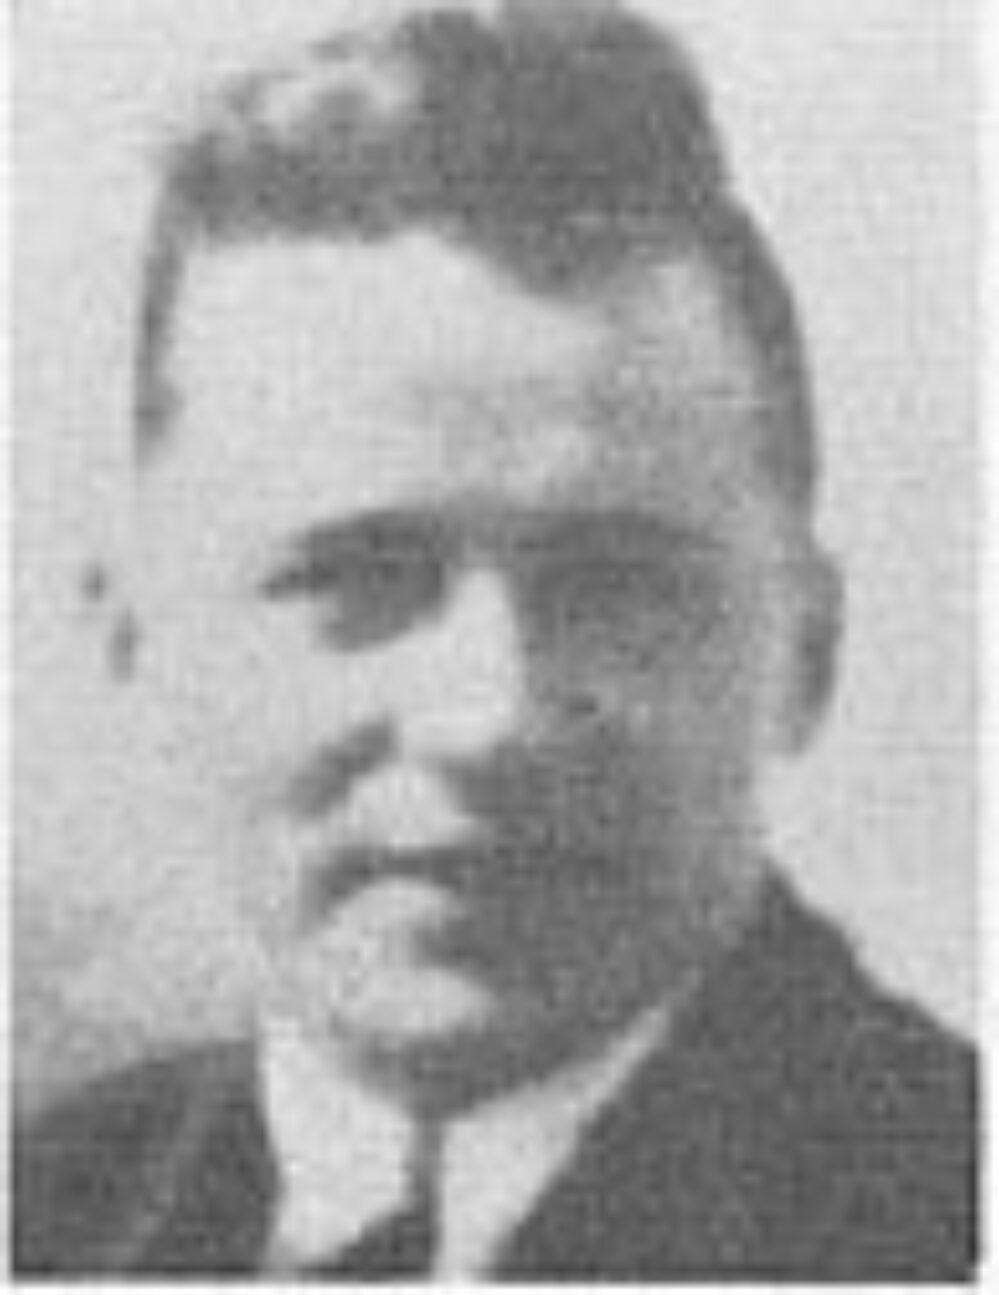 Nils Øistein Olsen